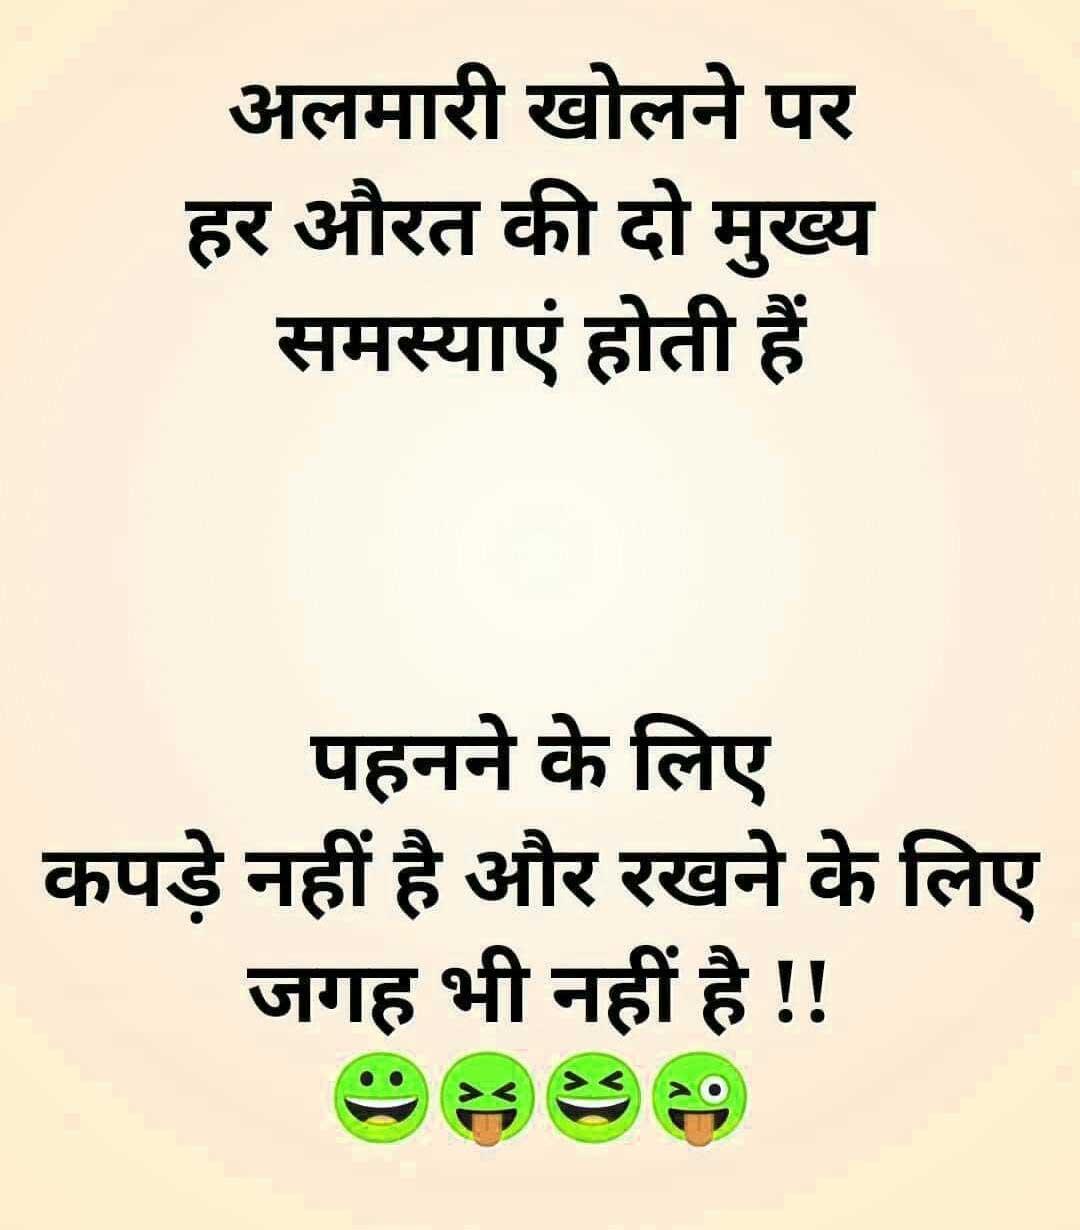 Latest Hindi Whatsapp Status Images Pics